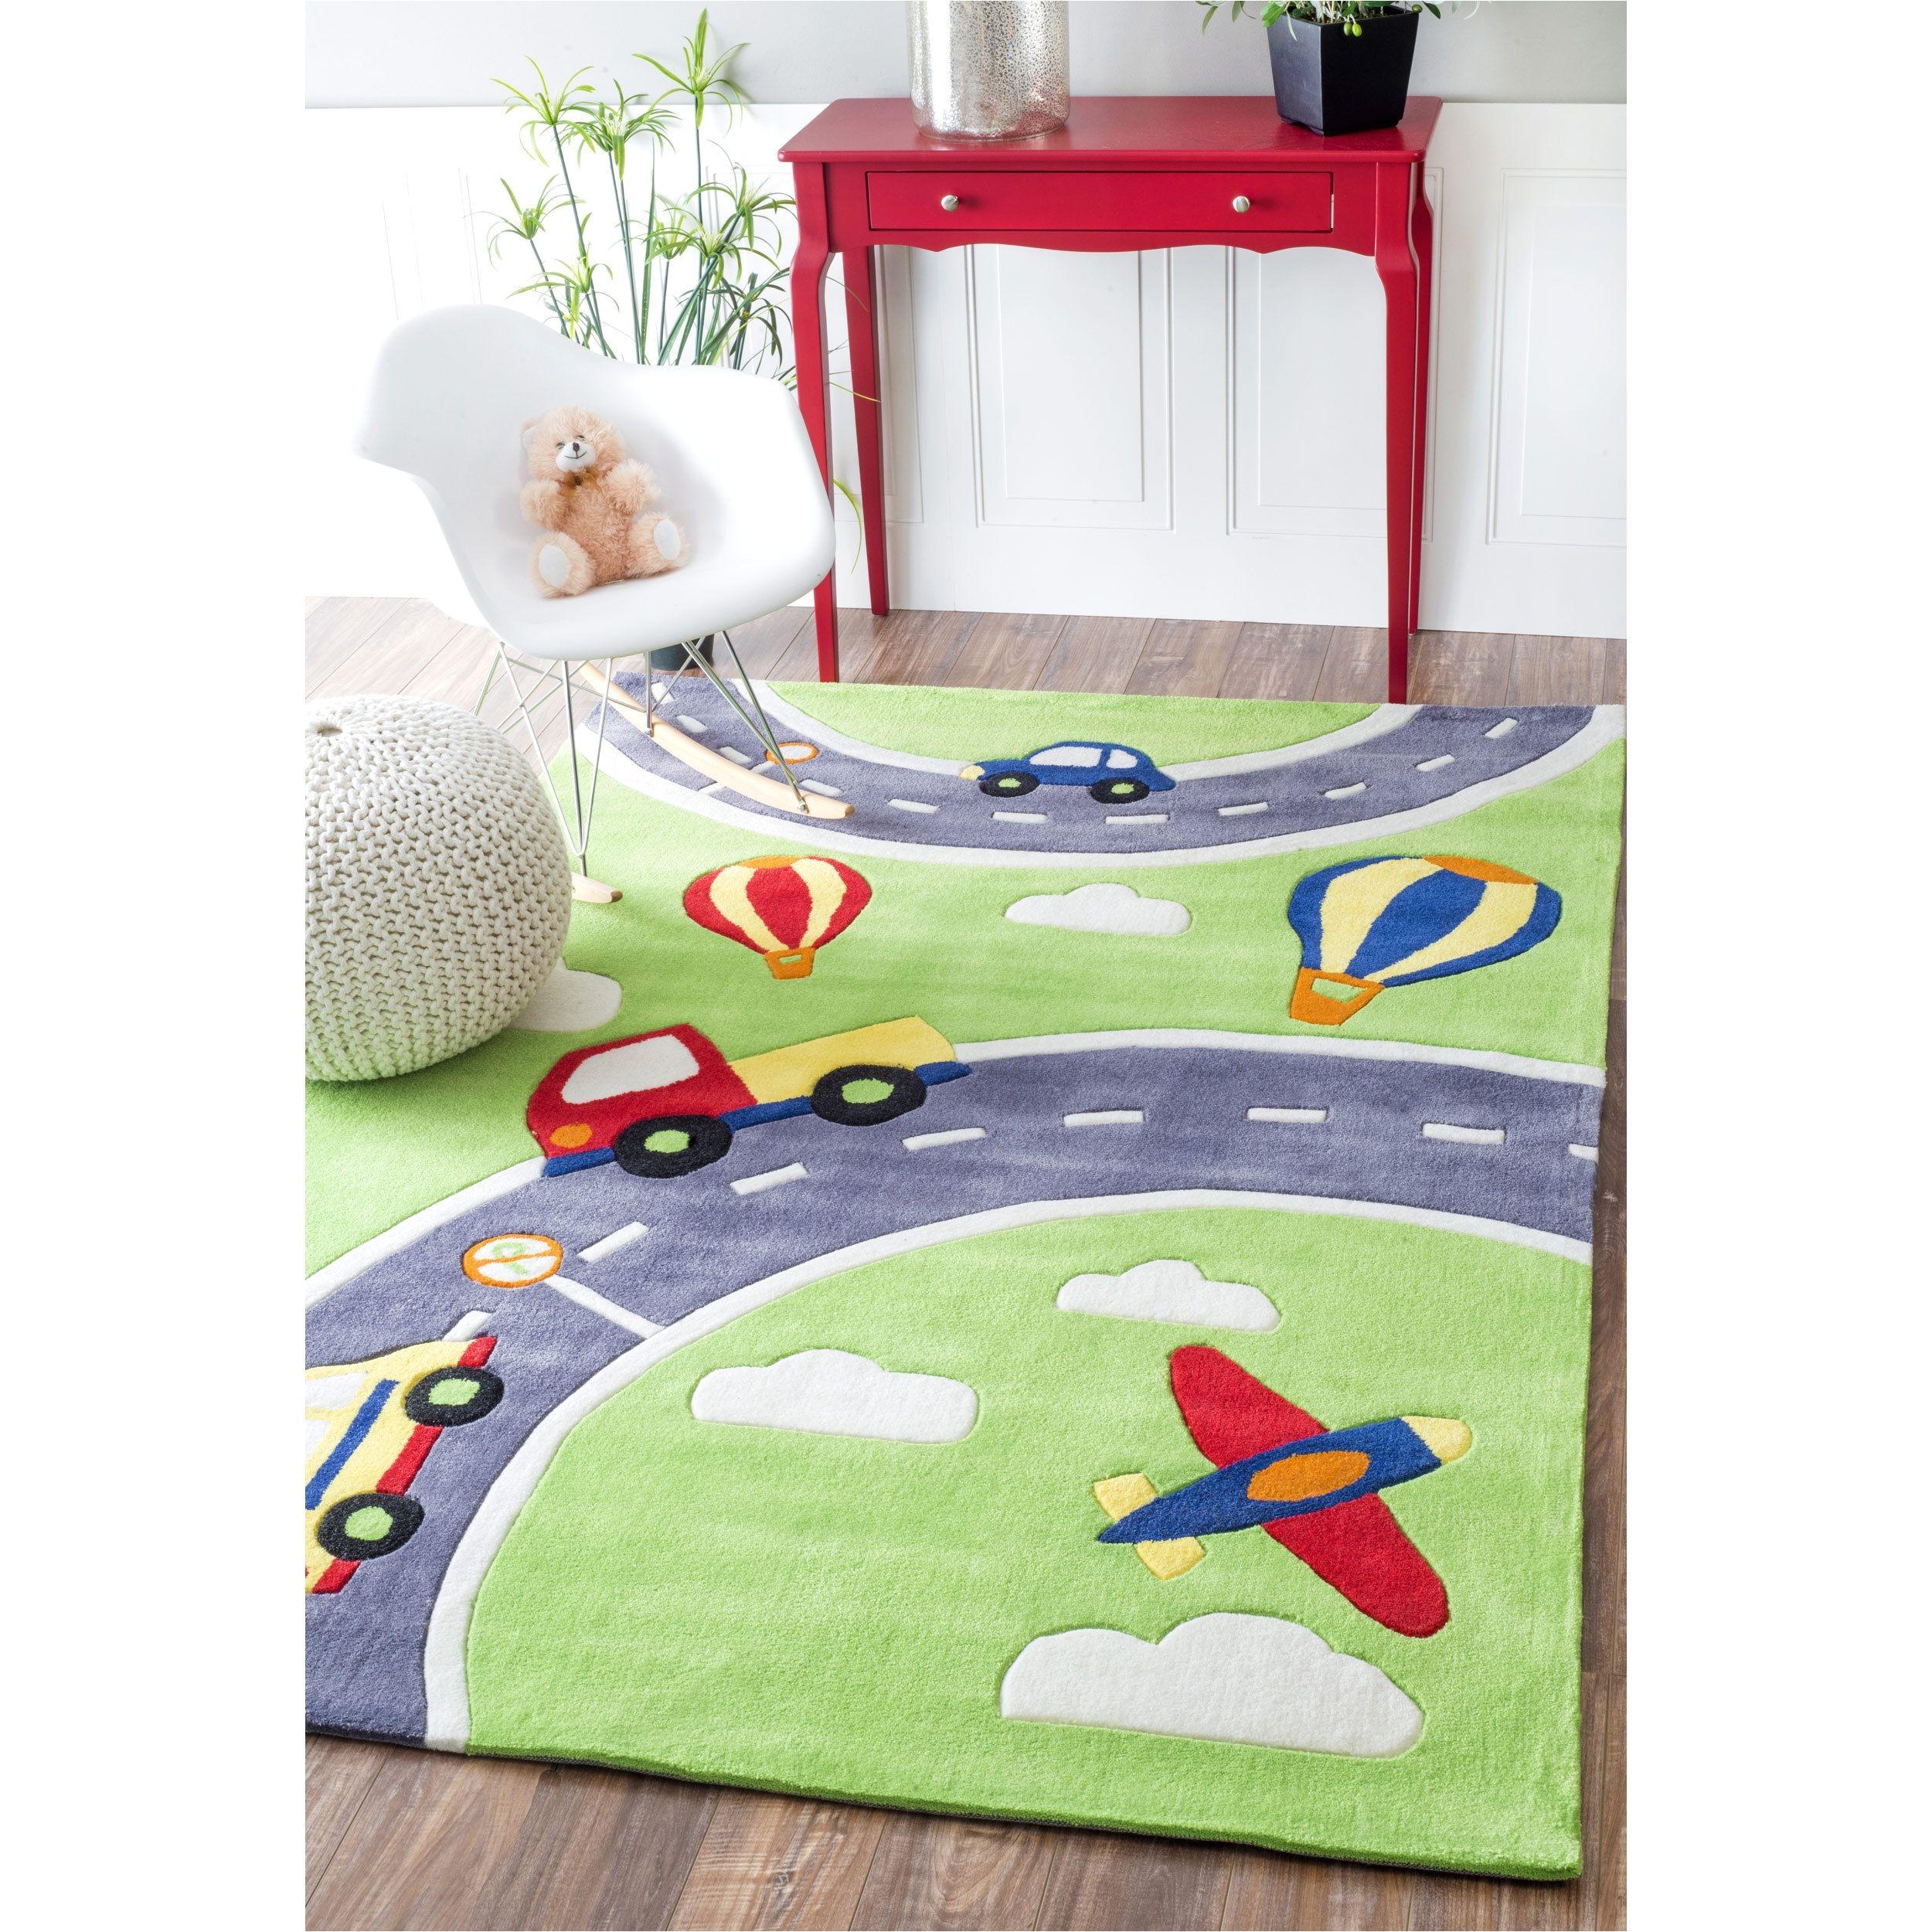 nuloom handmade modern city cars kids nurserygreen rug 5 x 7 6